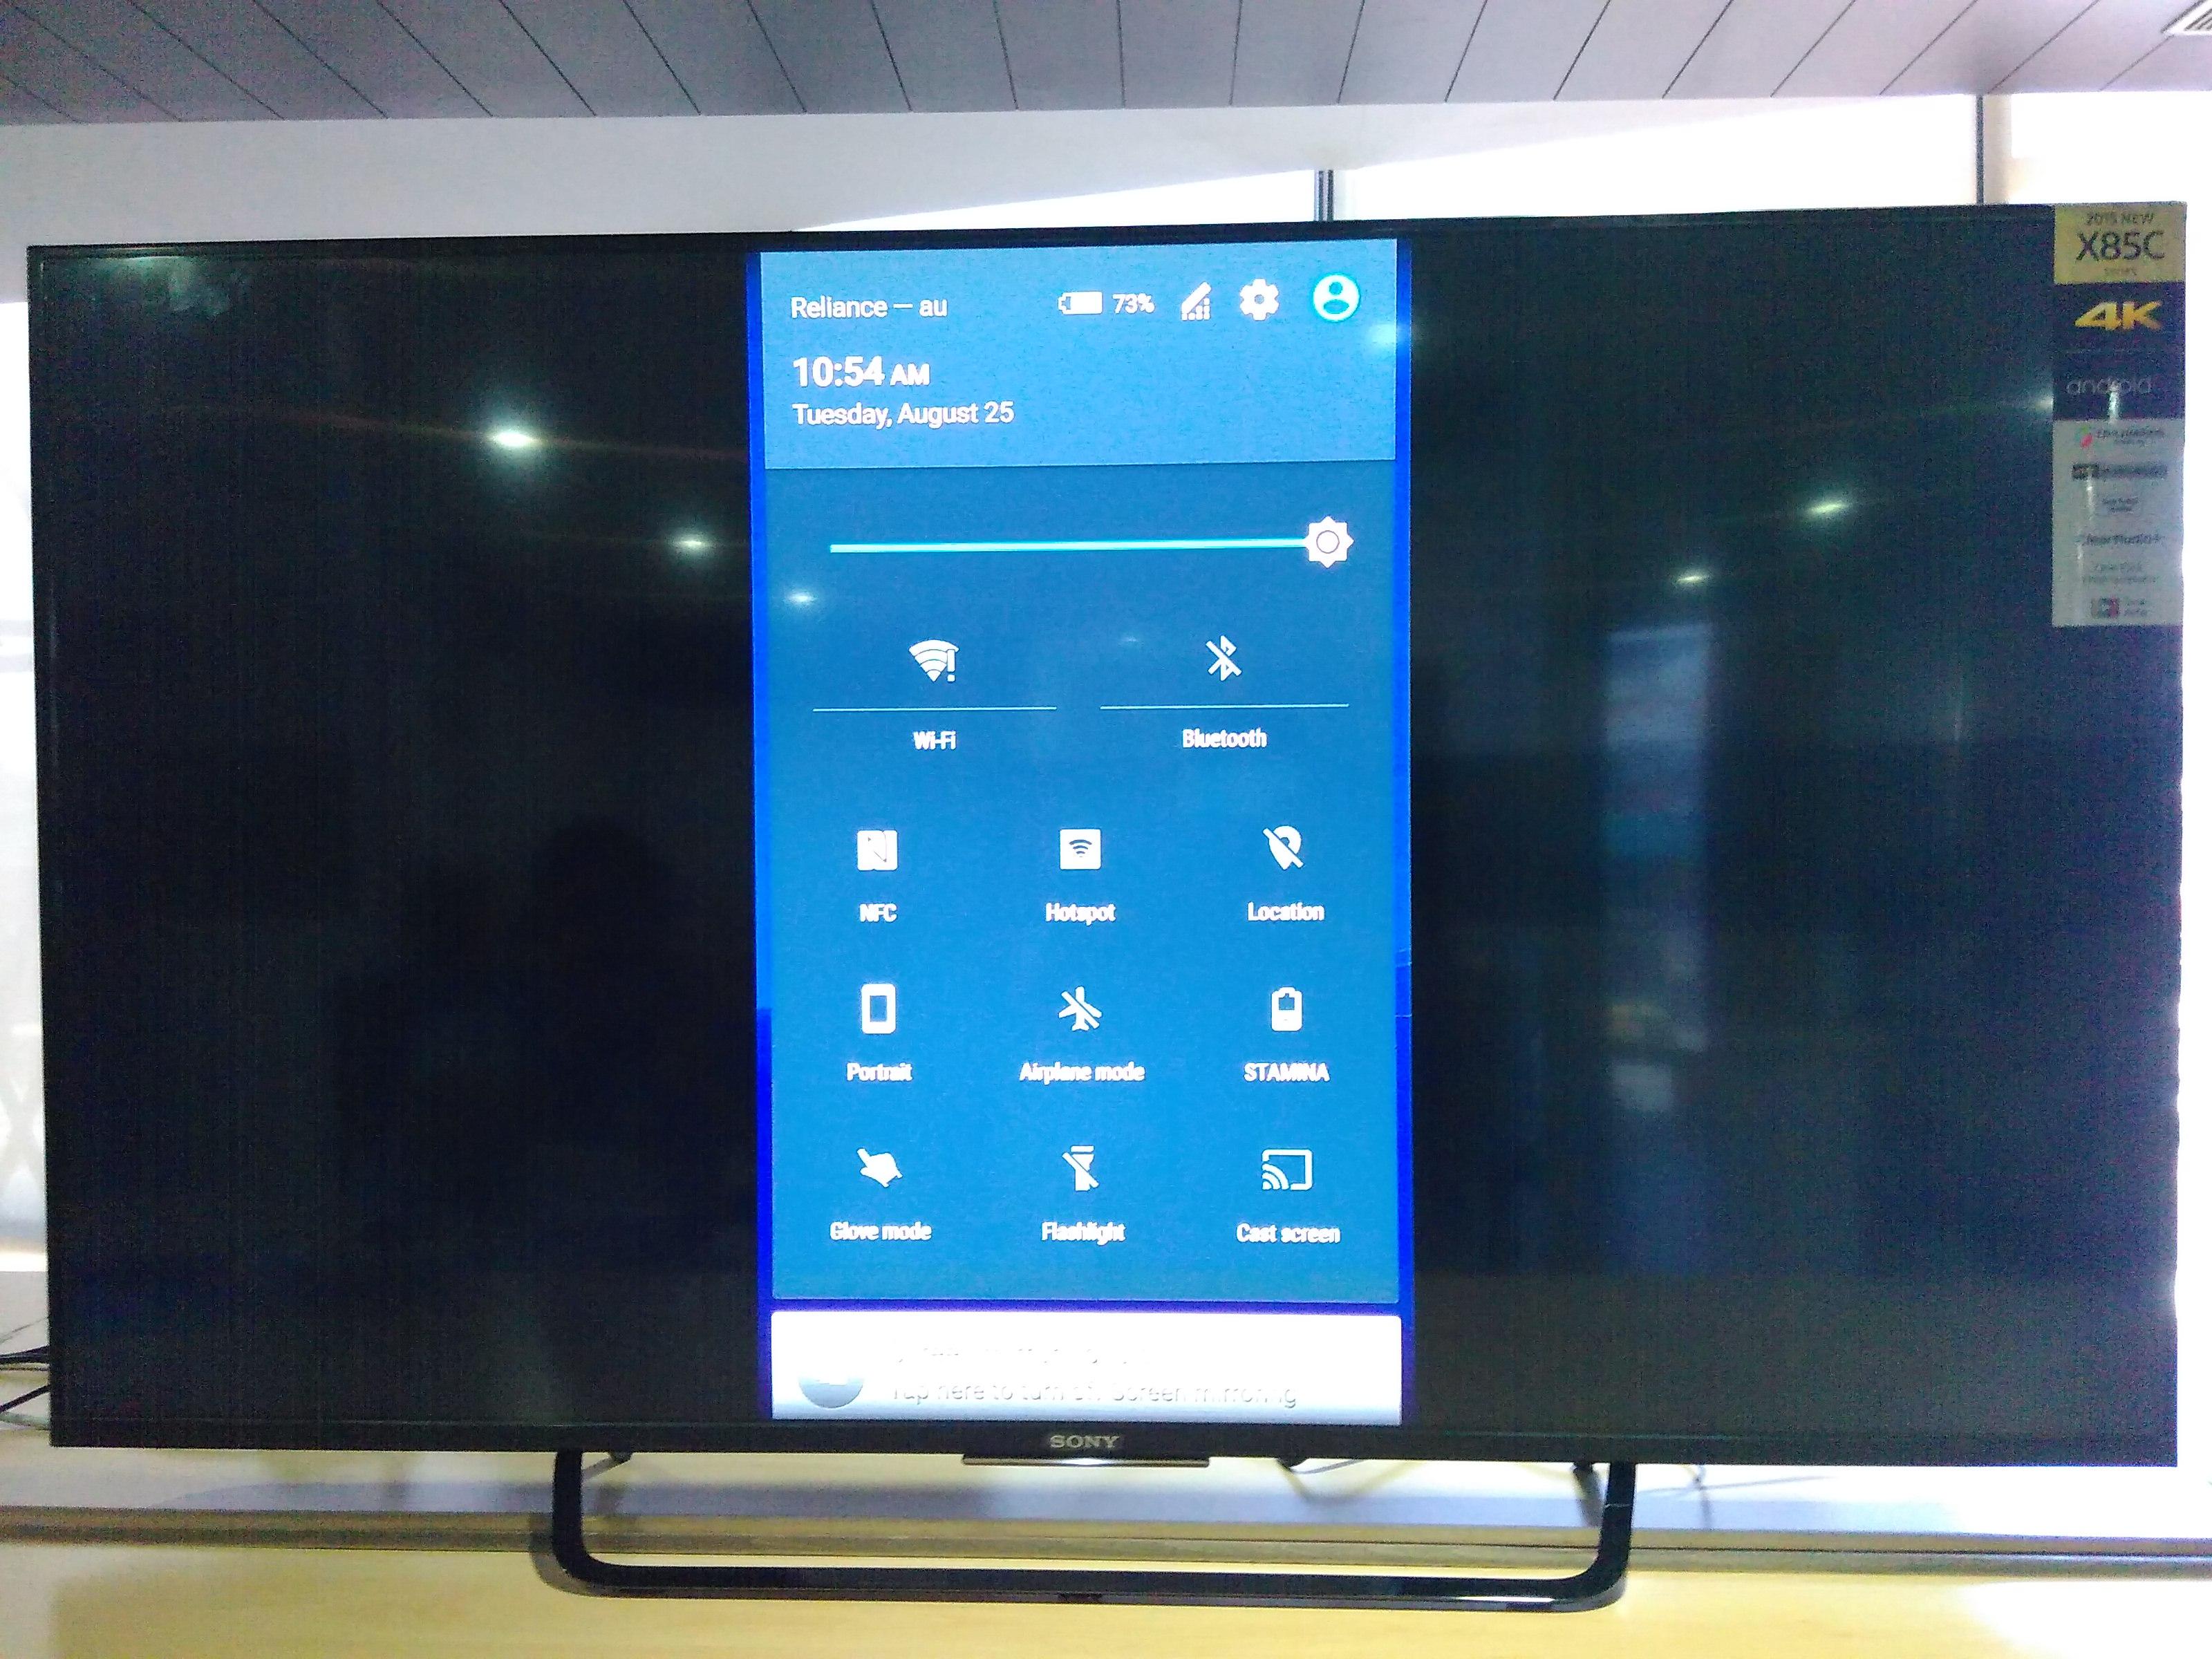 Xperia Z Ultra Price 4K Ultra HD Smart LED ...